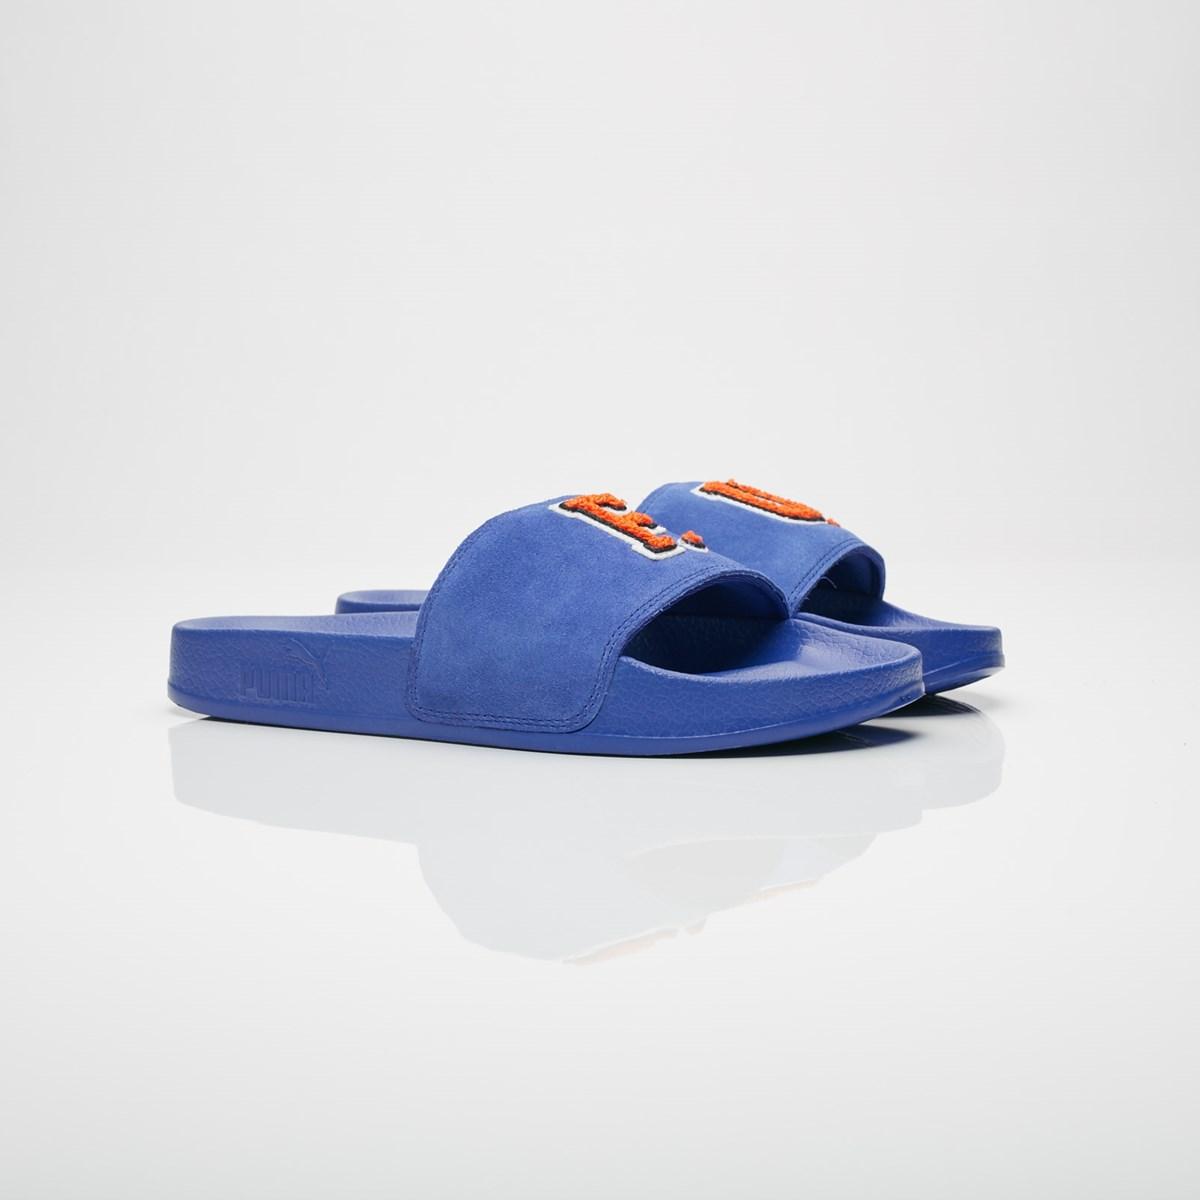 huge discount f1e10 82fc0 puma leadcat fu 367087 01 sneakers  streetwear på nätet sen 1999